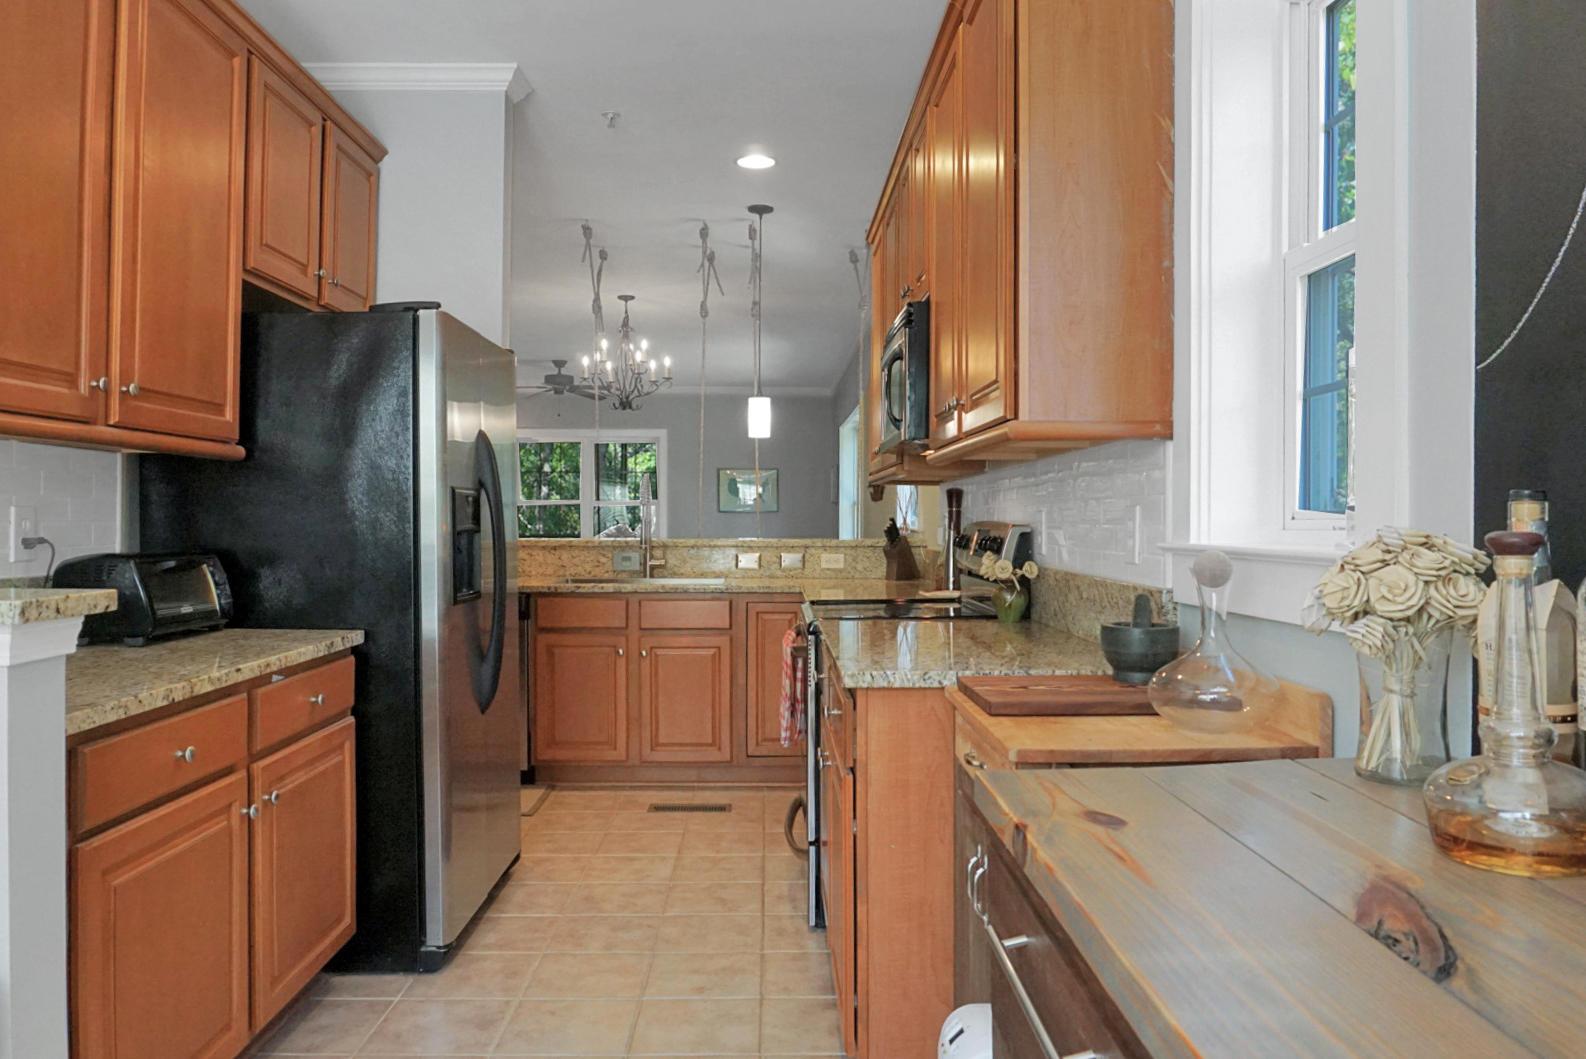 Etiwan Pointe Homes For Sale - 269 Etiwan Pointe, Mount Pleasant, SC - 41